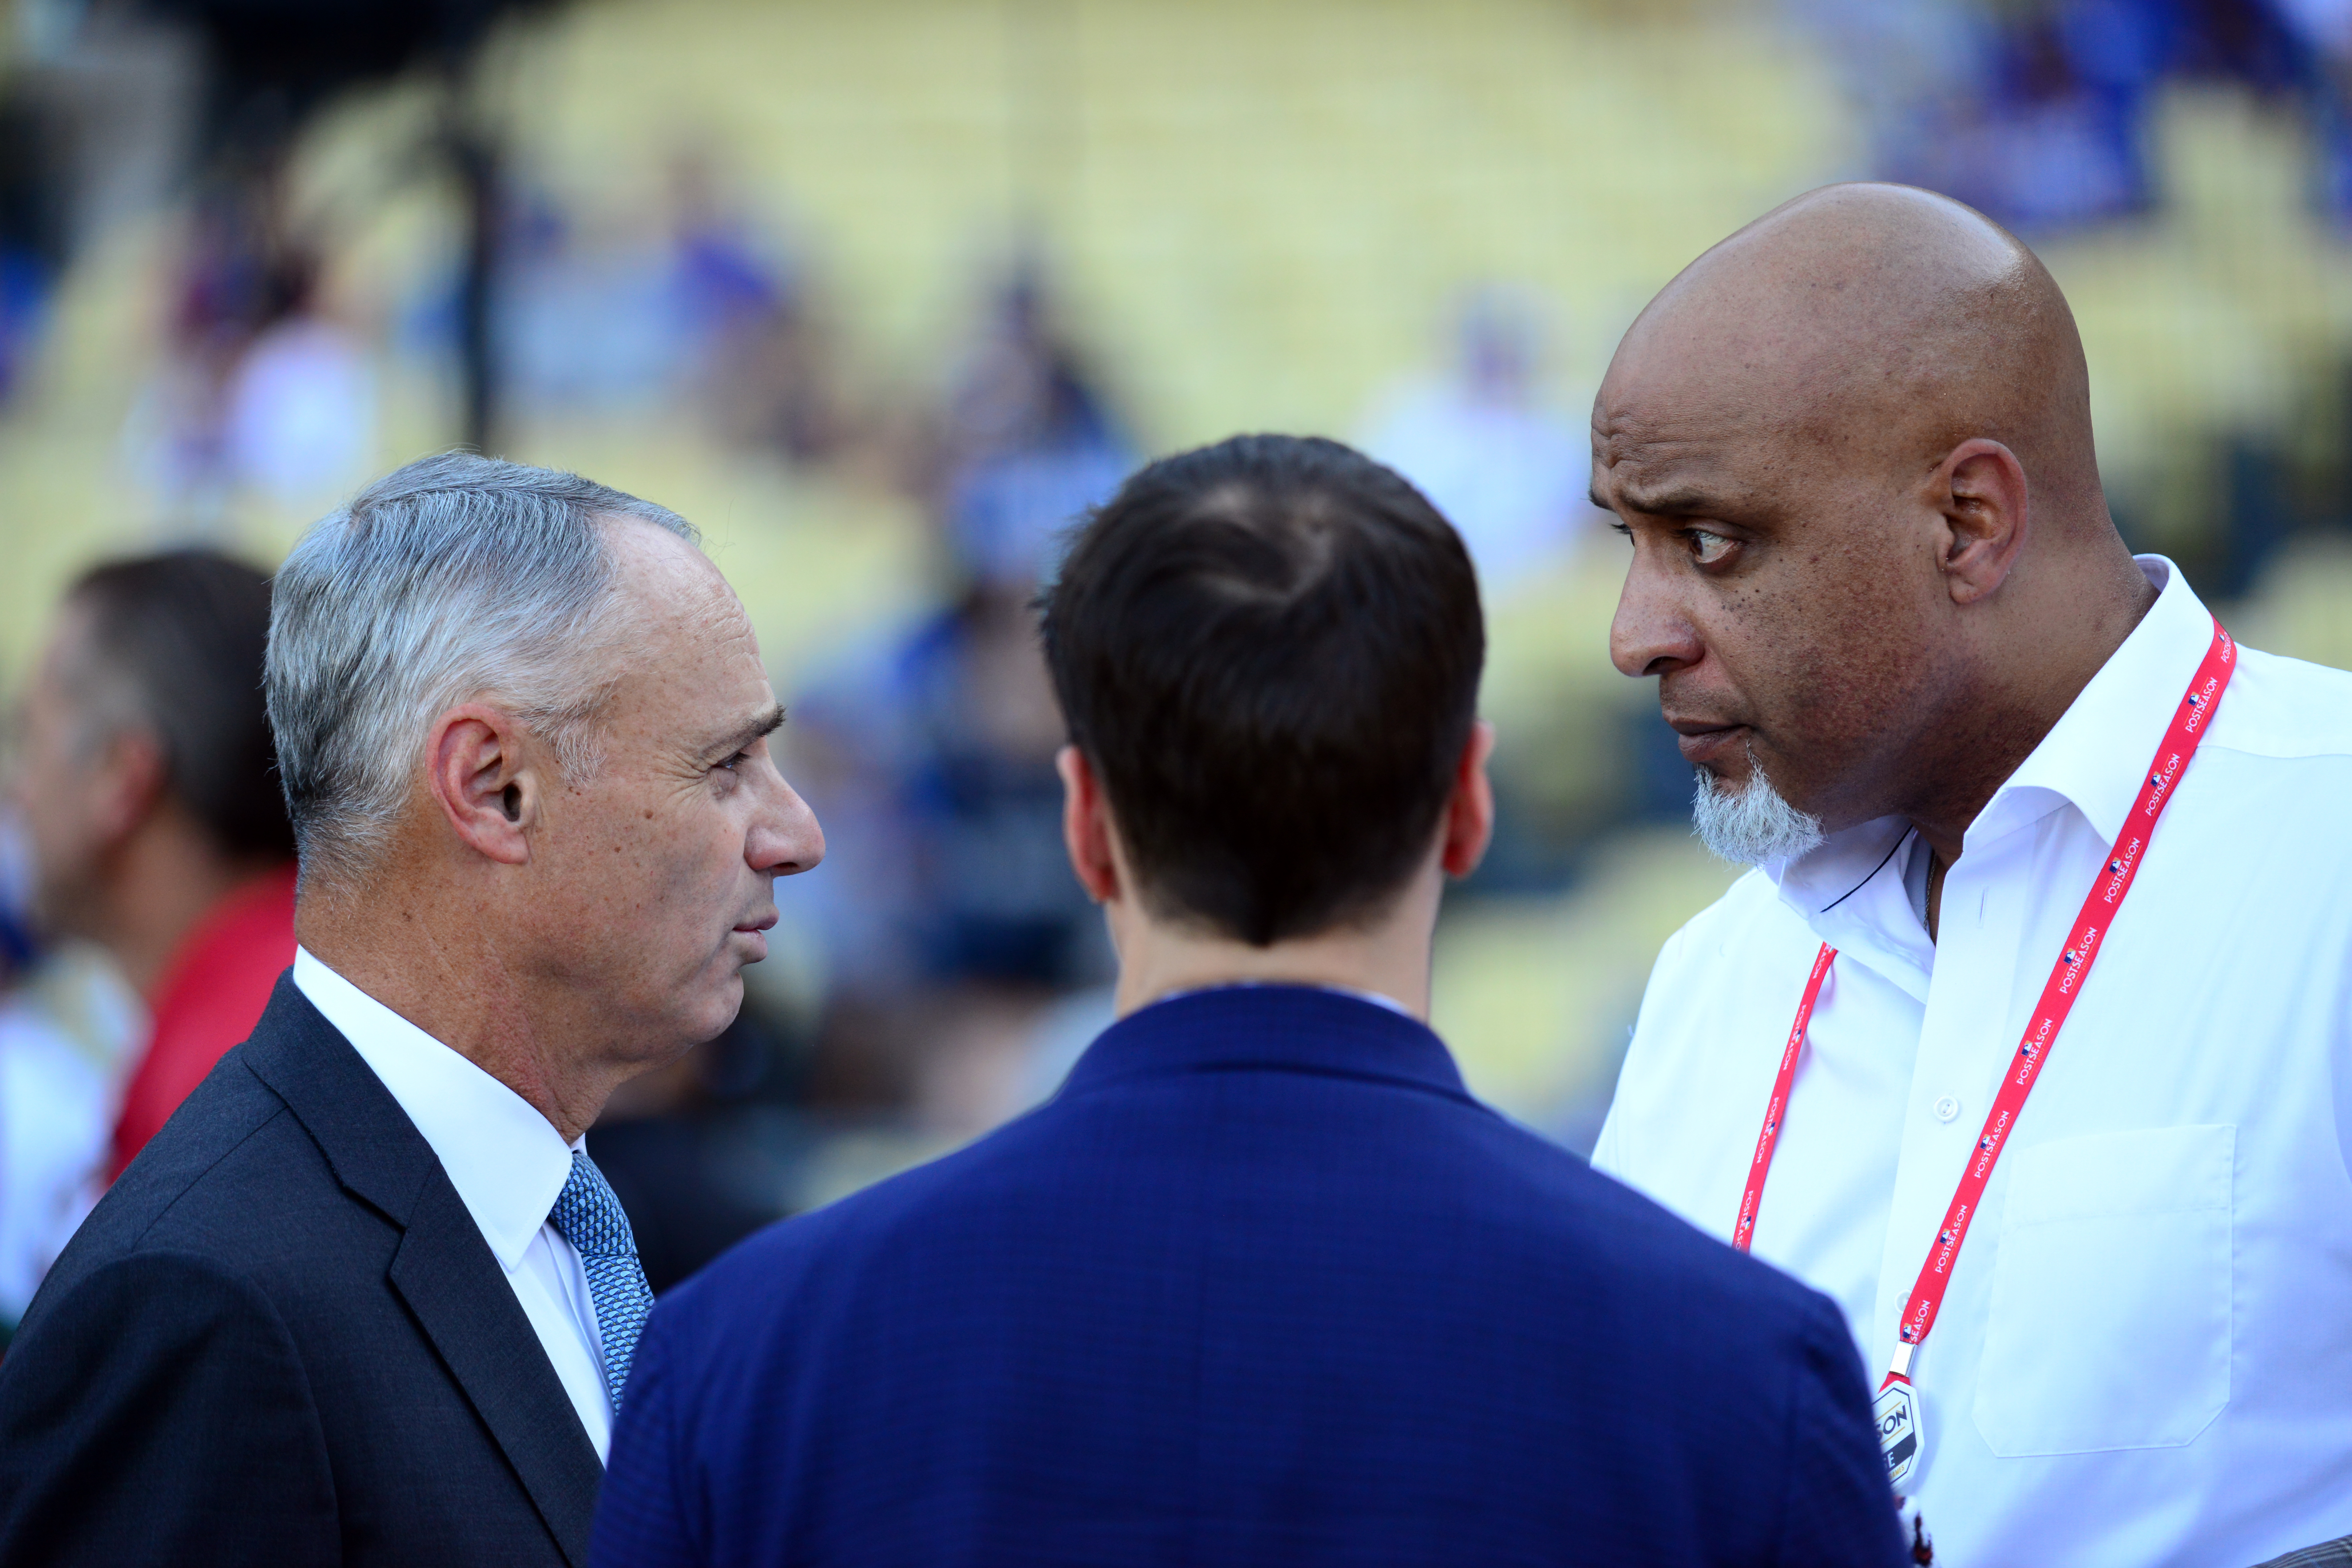 2017 Major League Baseball World Series Game Two: Houston Astros v. Los Angeles Dodgers